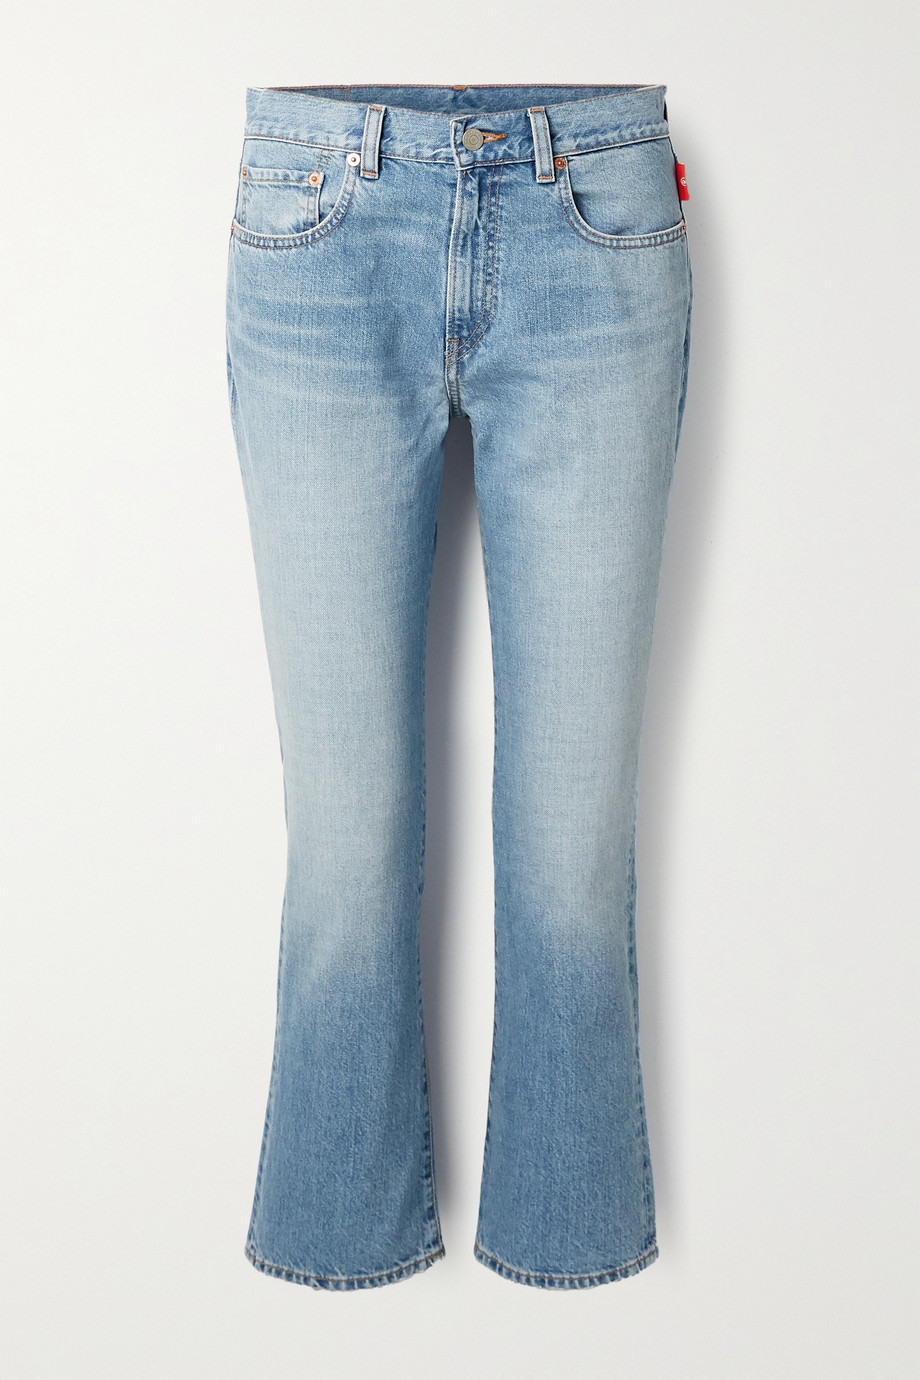 Denimist Tracer mid-rise flared jeans